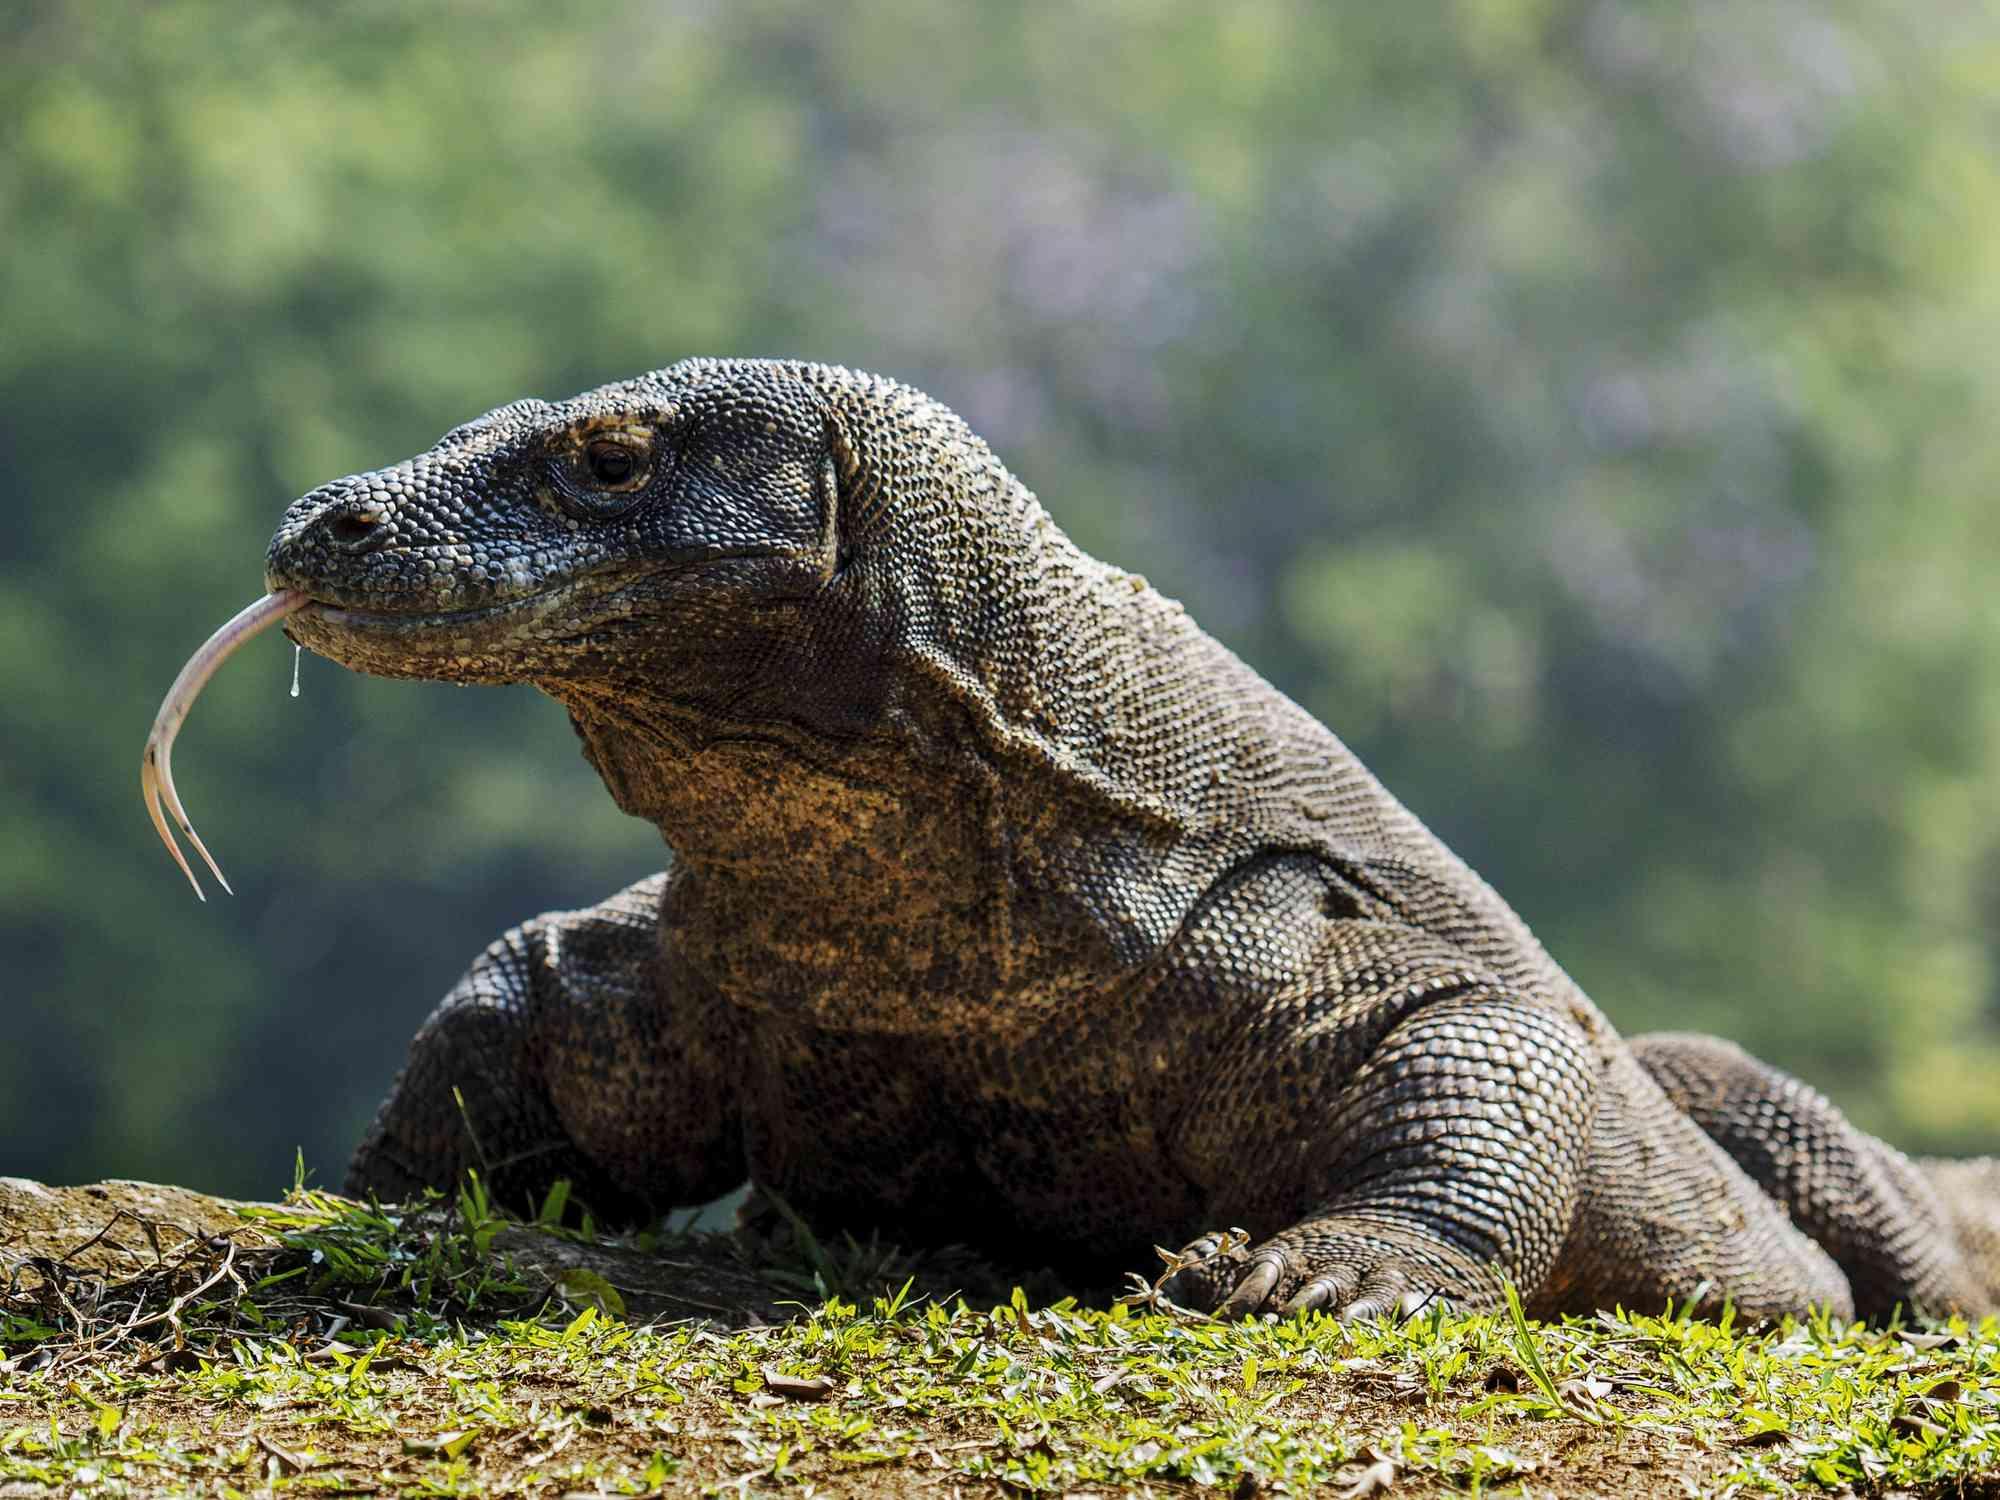 Komodo dragon in Jakarta, Indonesia